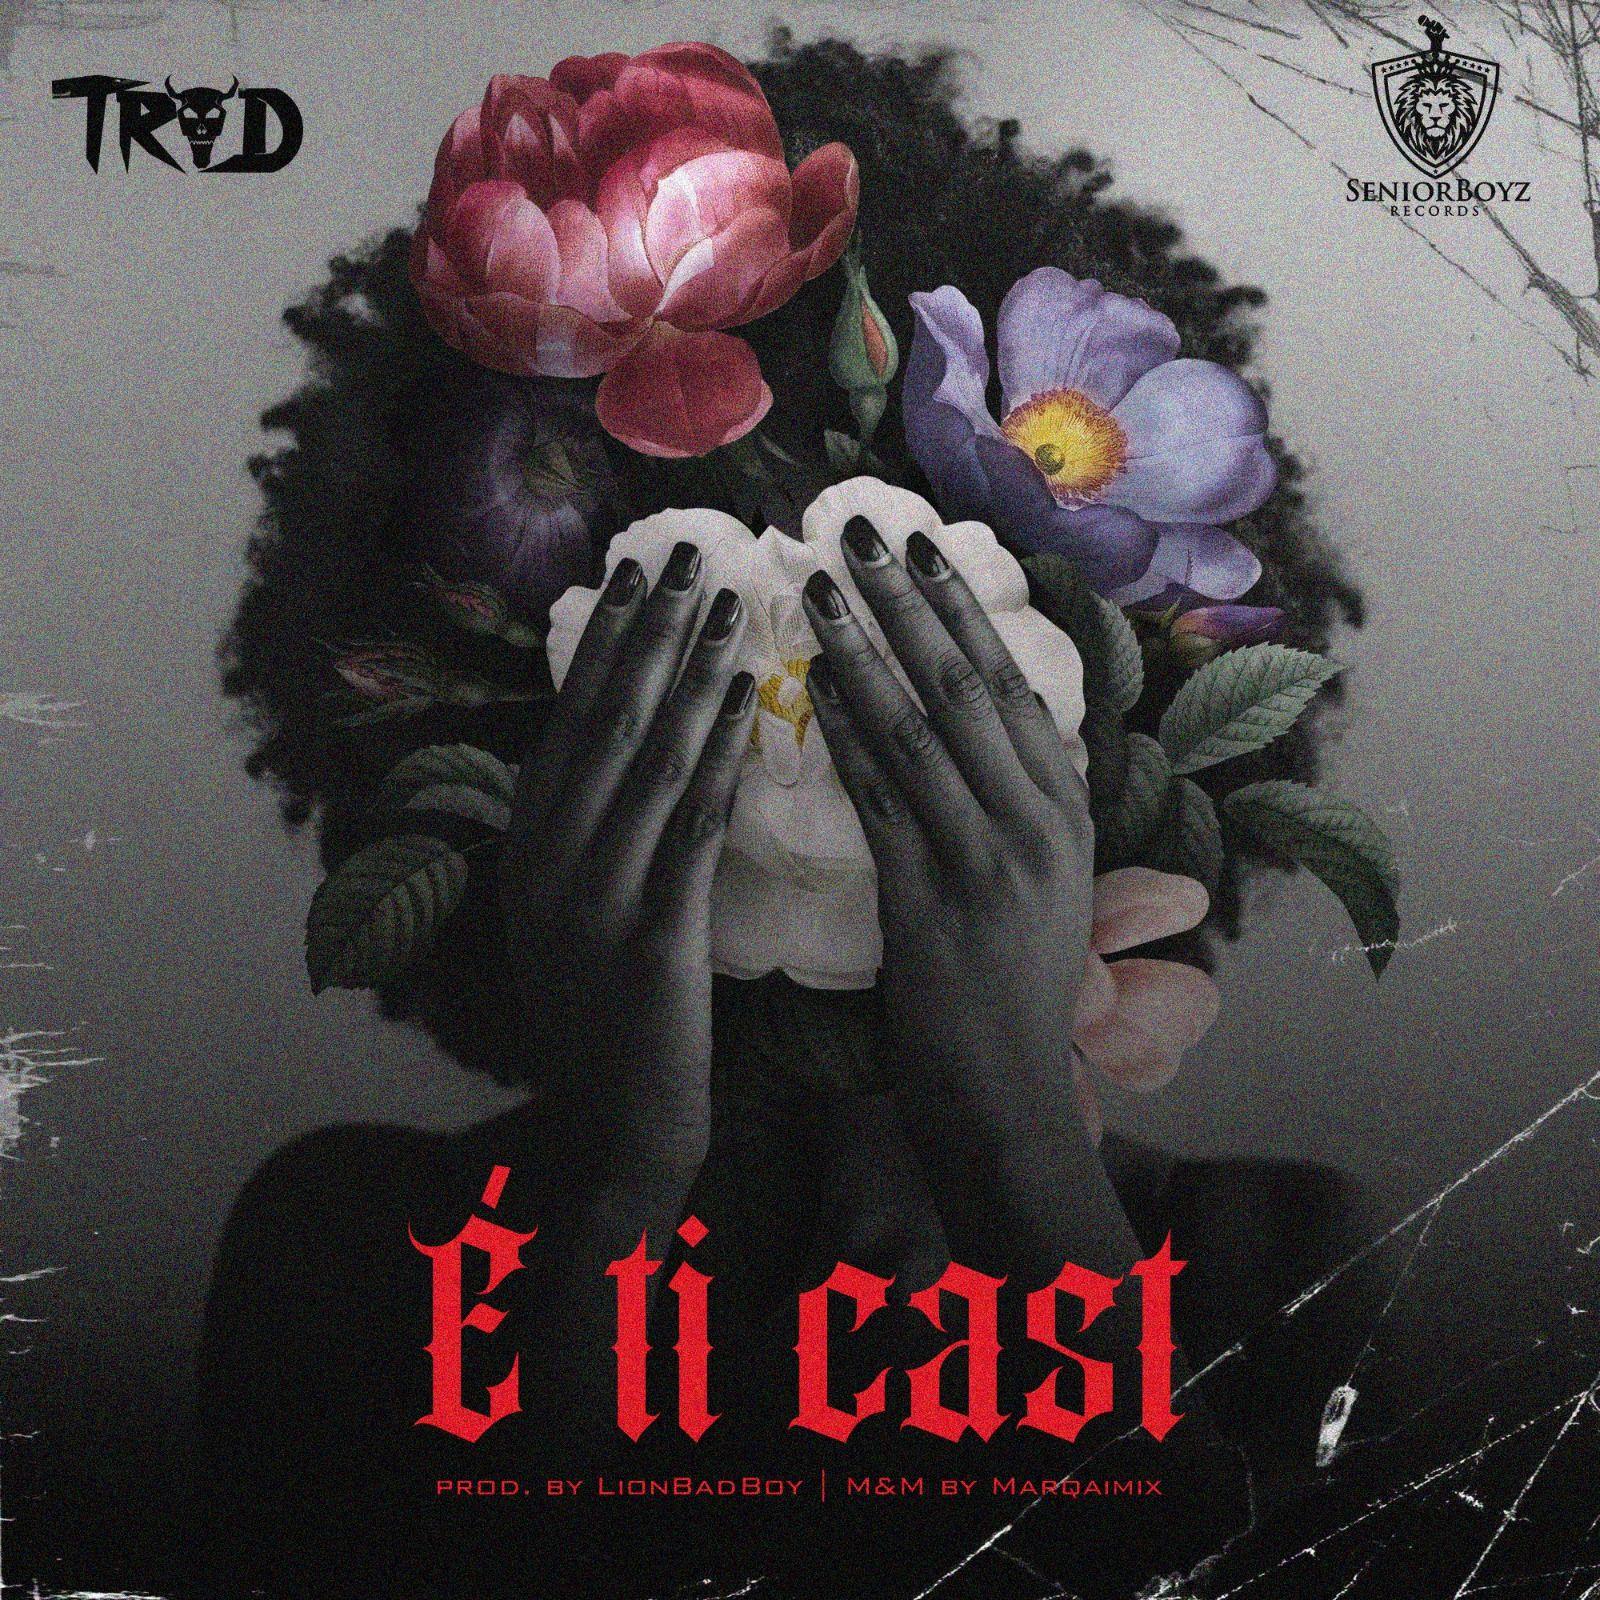 [Music] Trod – E Ti Cast